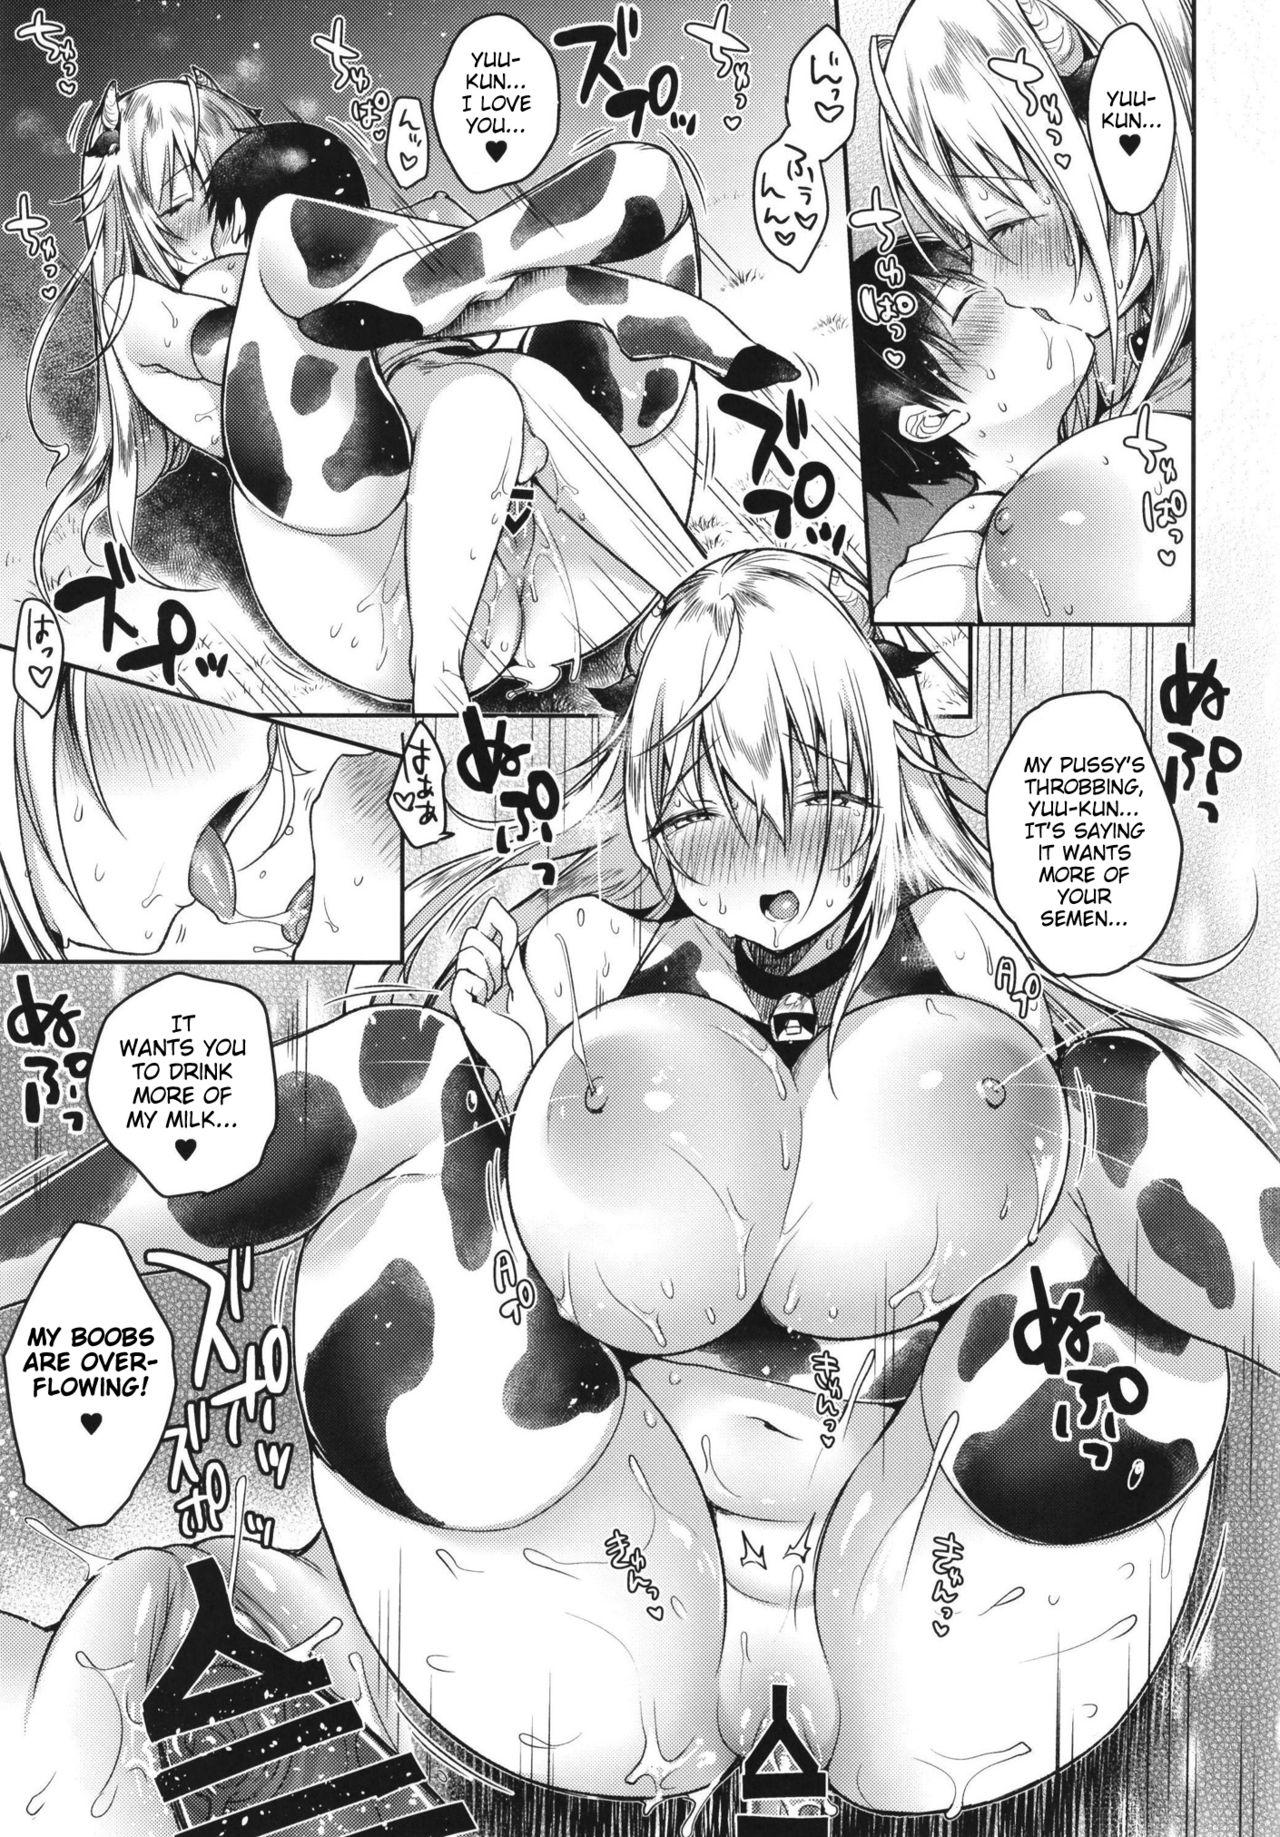 Makiba no Bonyuu Nikki 4 | Ranch Breast Milk Diary 4 20